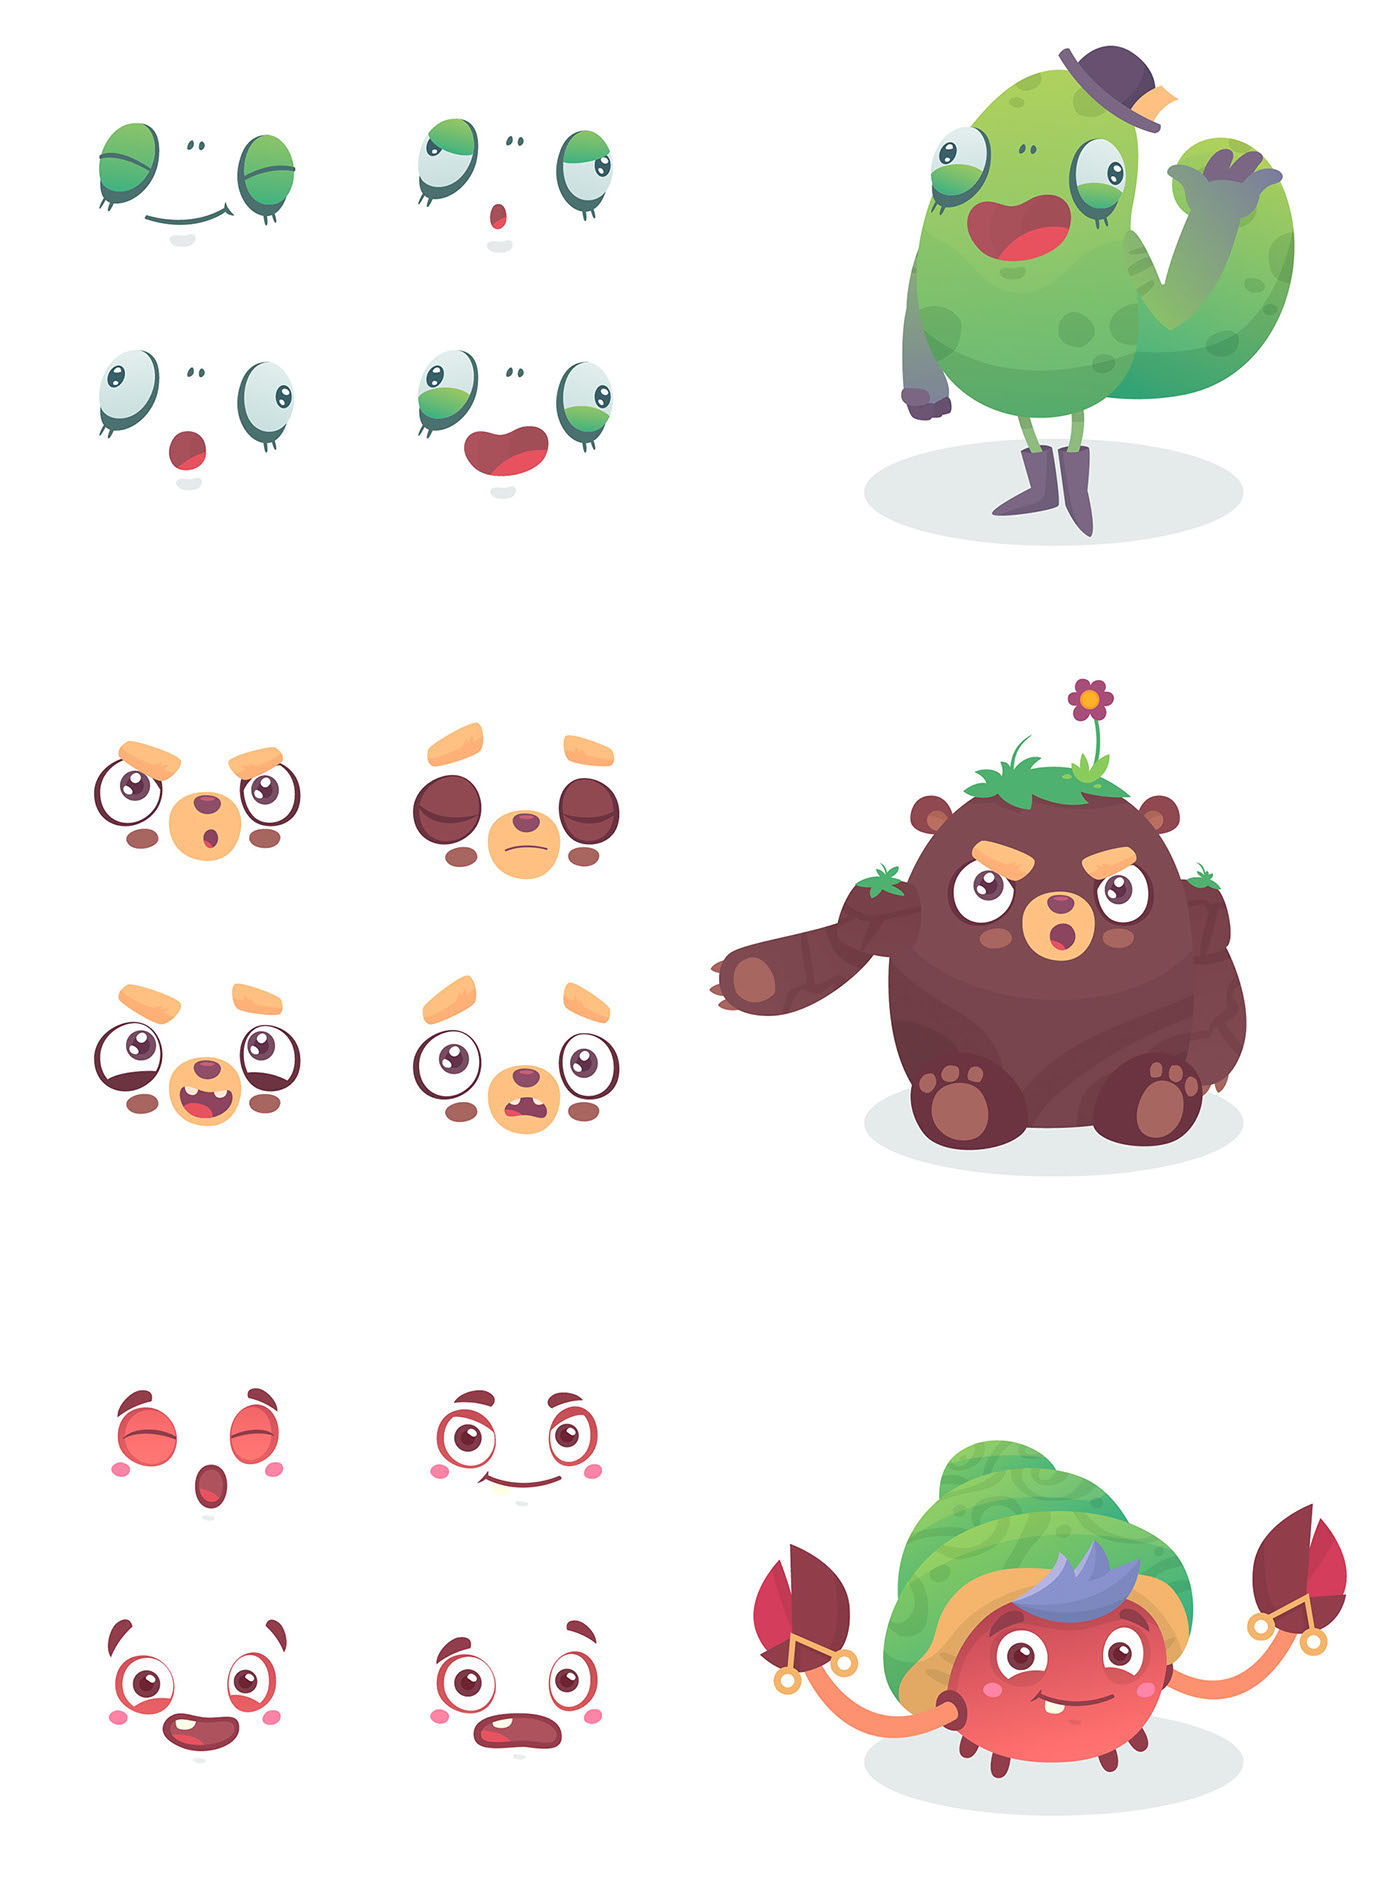 ilustracion videojuegos game curso characters personajes